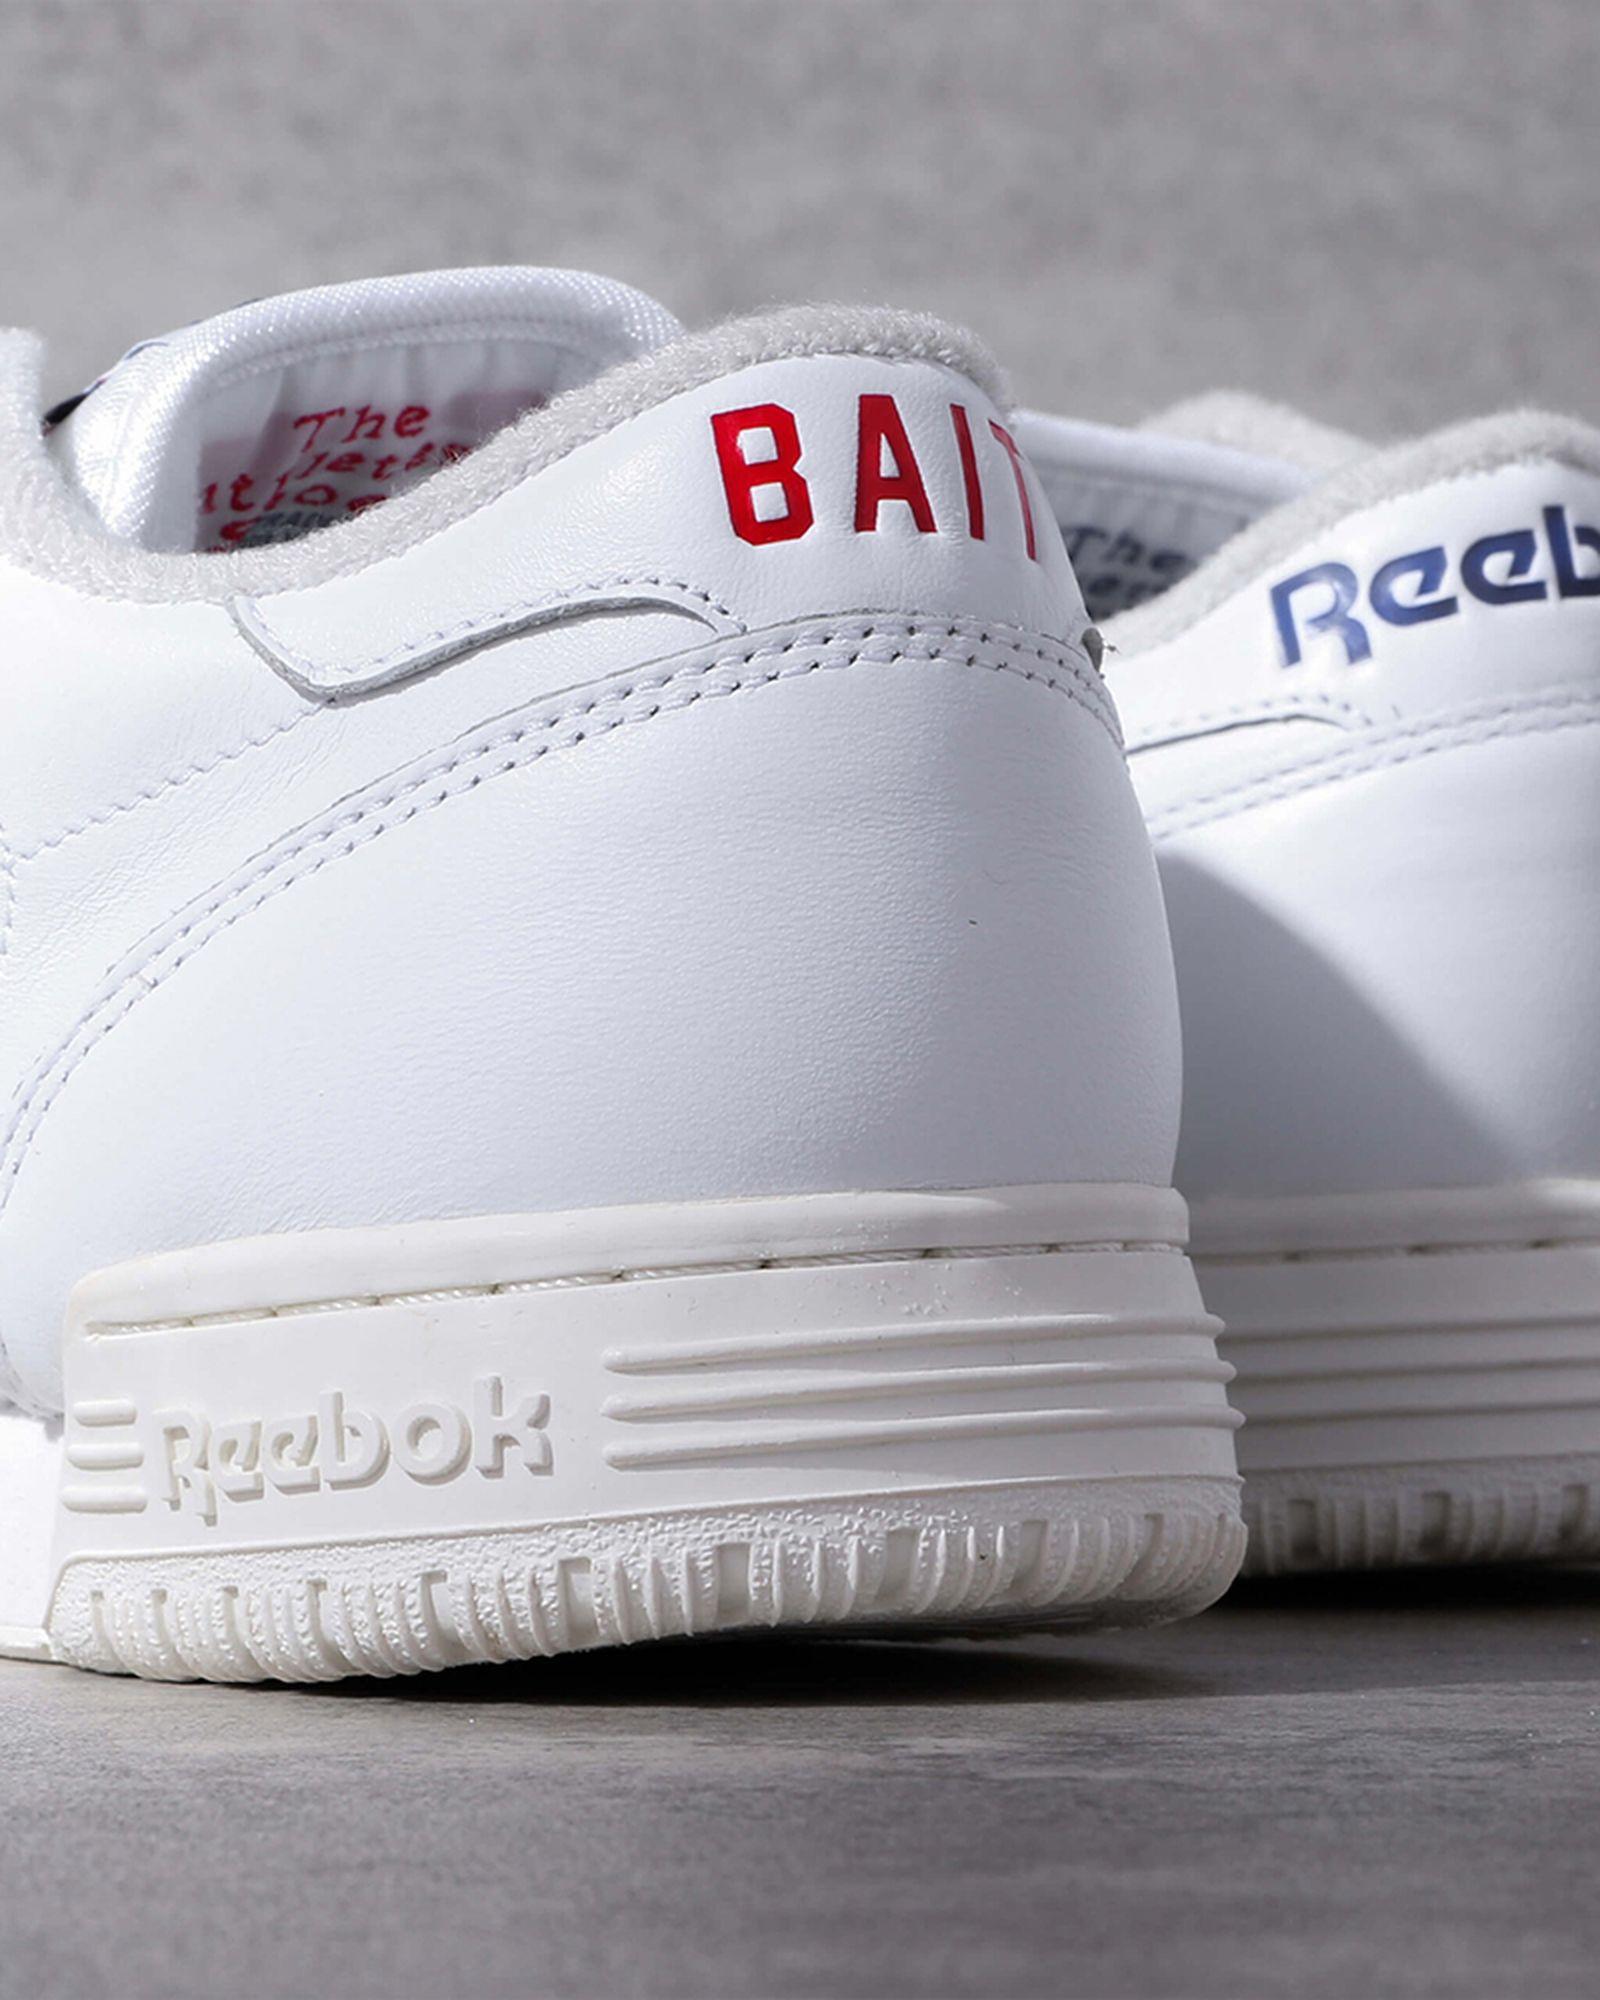 bait-reebok-west-east-pack-release-date-price-04